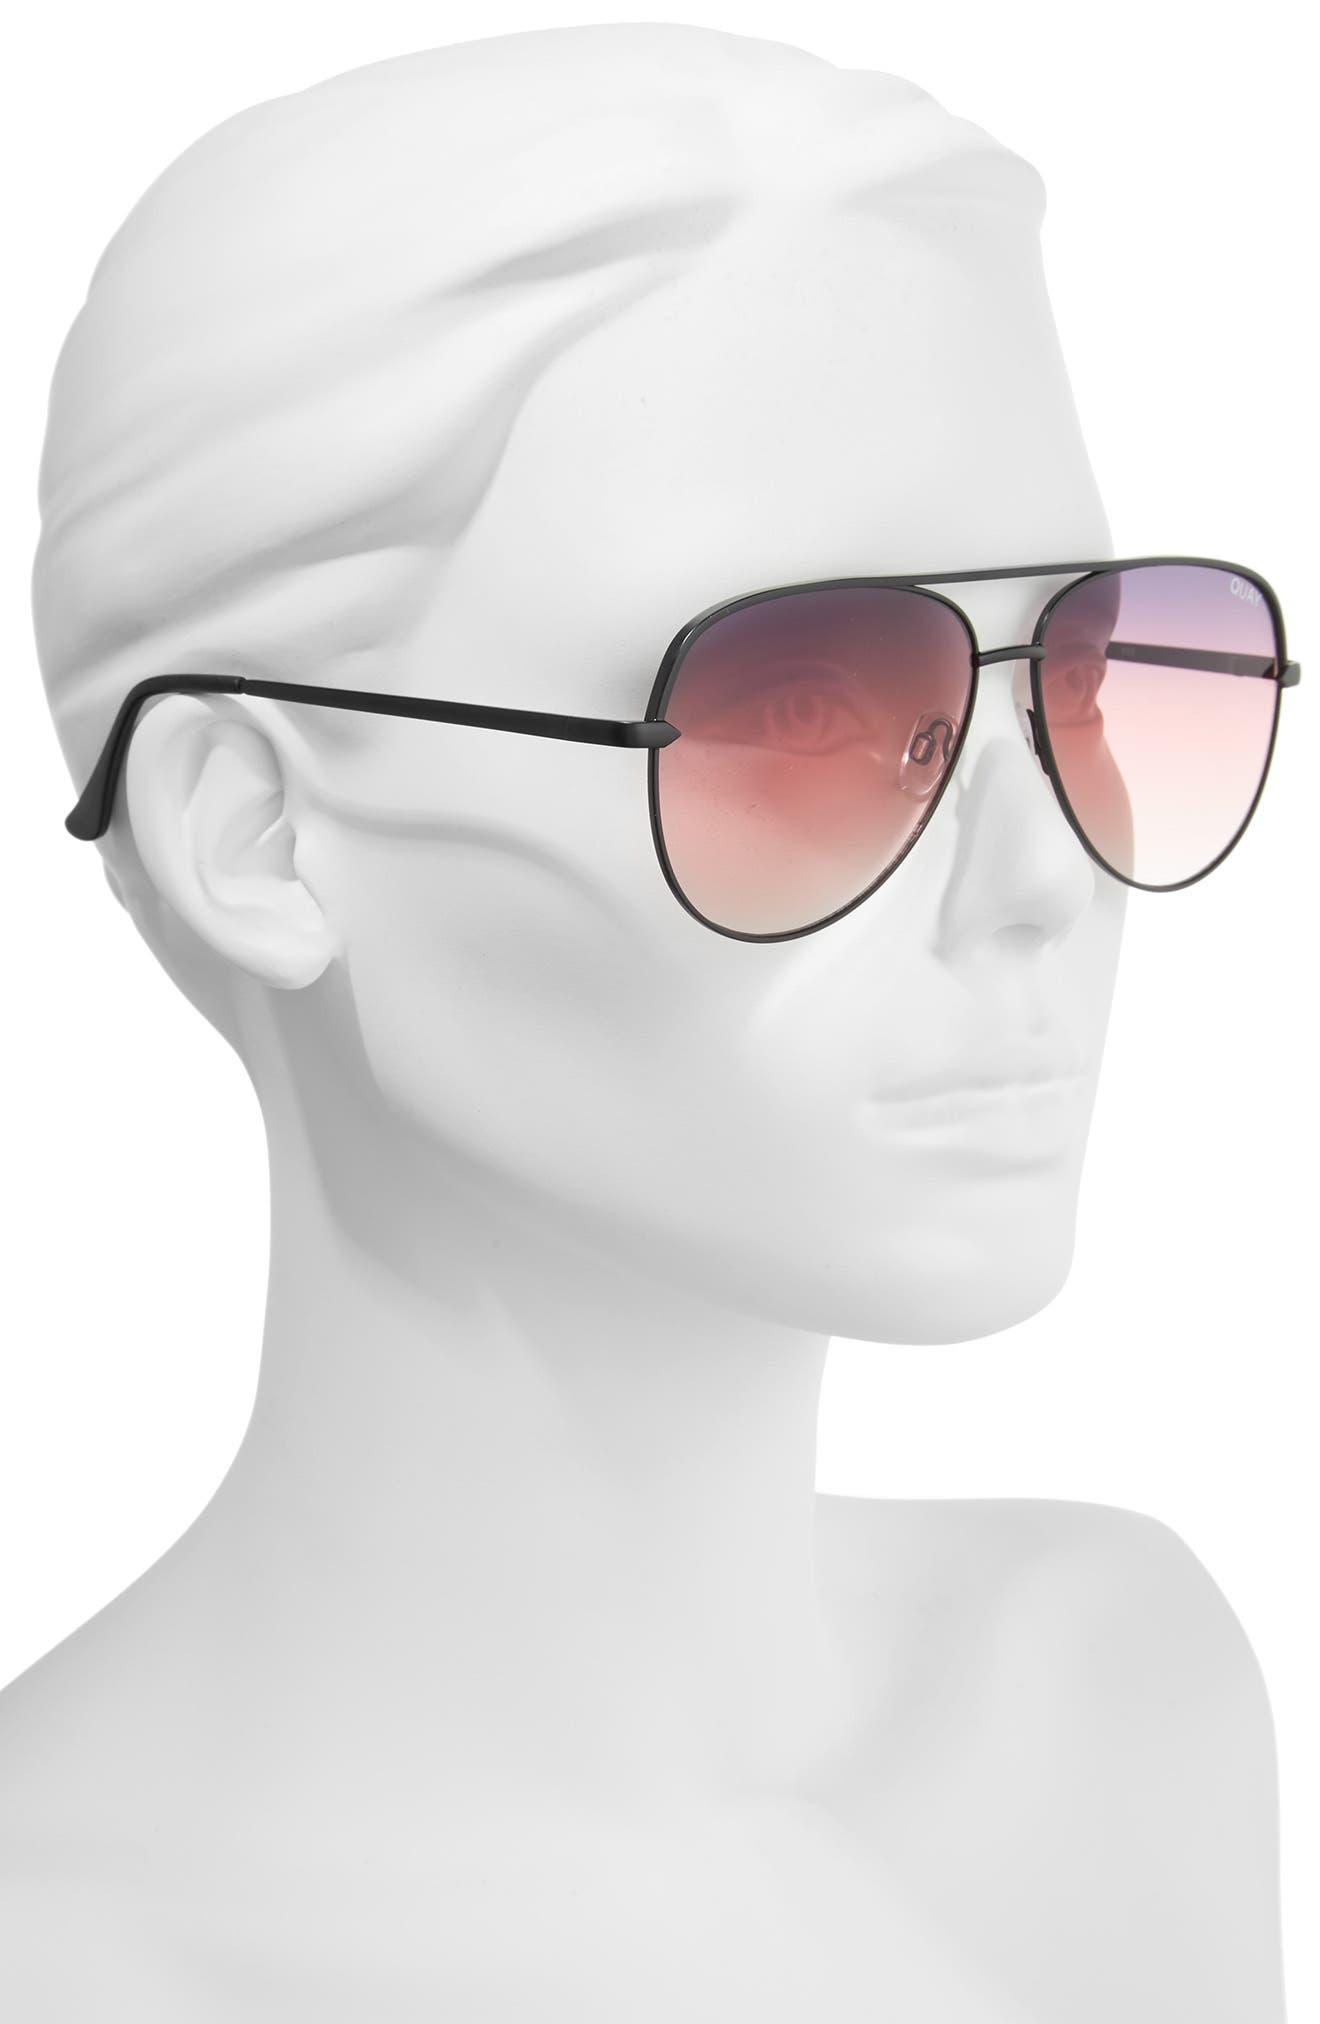 x Desi Perkins Sahara 60mm Aviator Sunglasses,                             Alternate thumbnail 2, color,                             BLACK/ PURPLE/ FADE